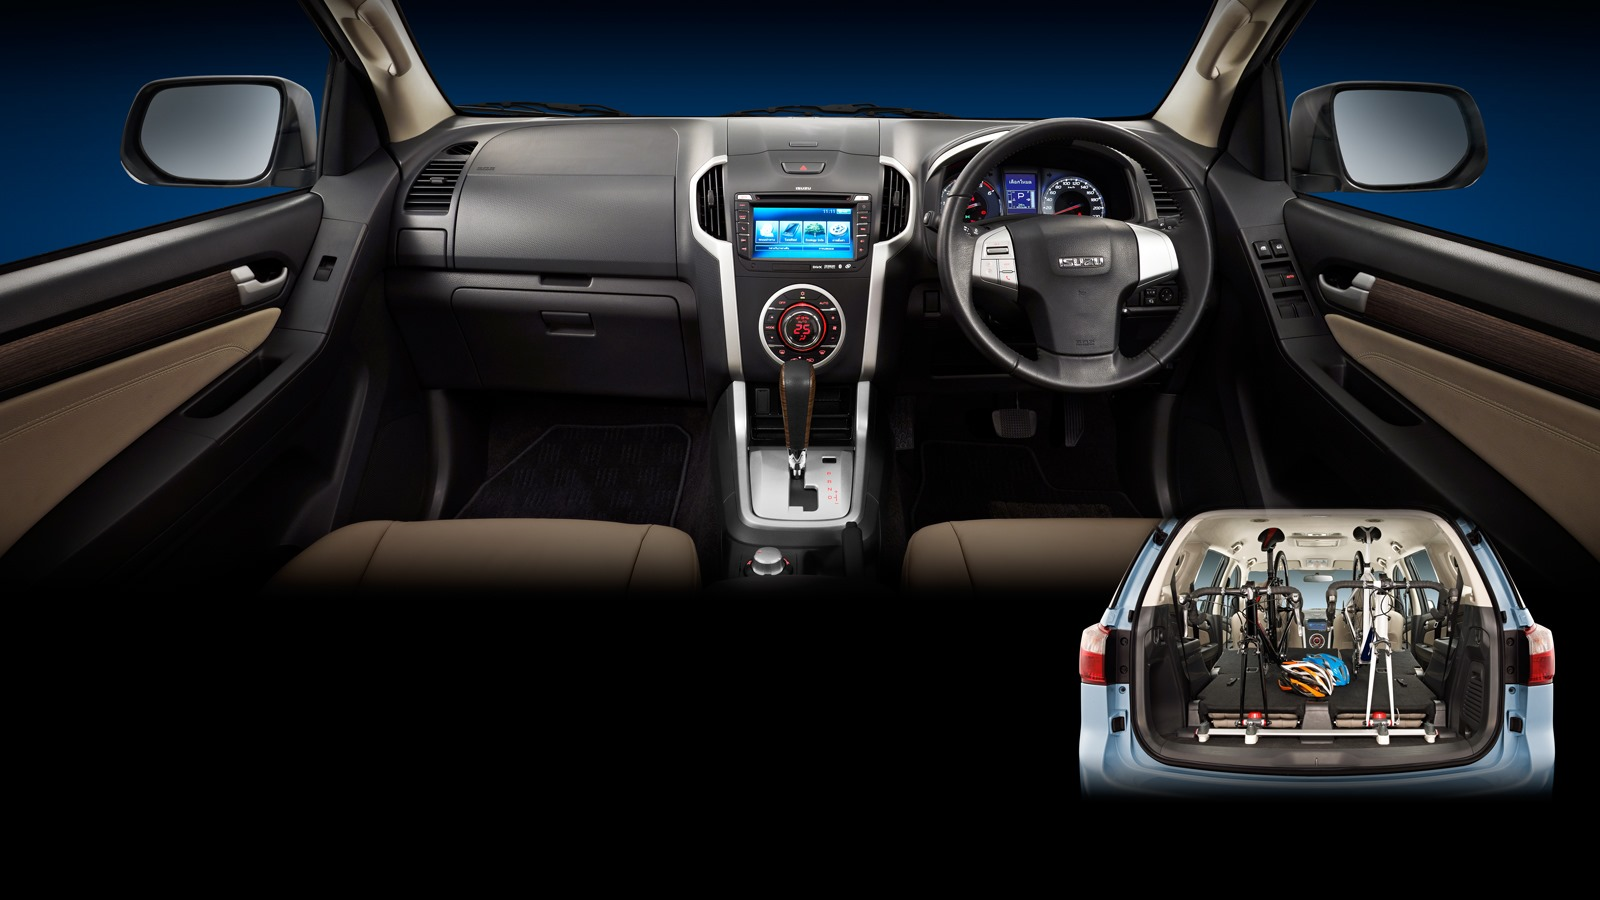 Isuzu Mu X Interior Autonetmagz Review Mobil Dan